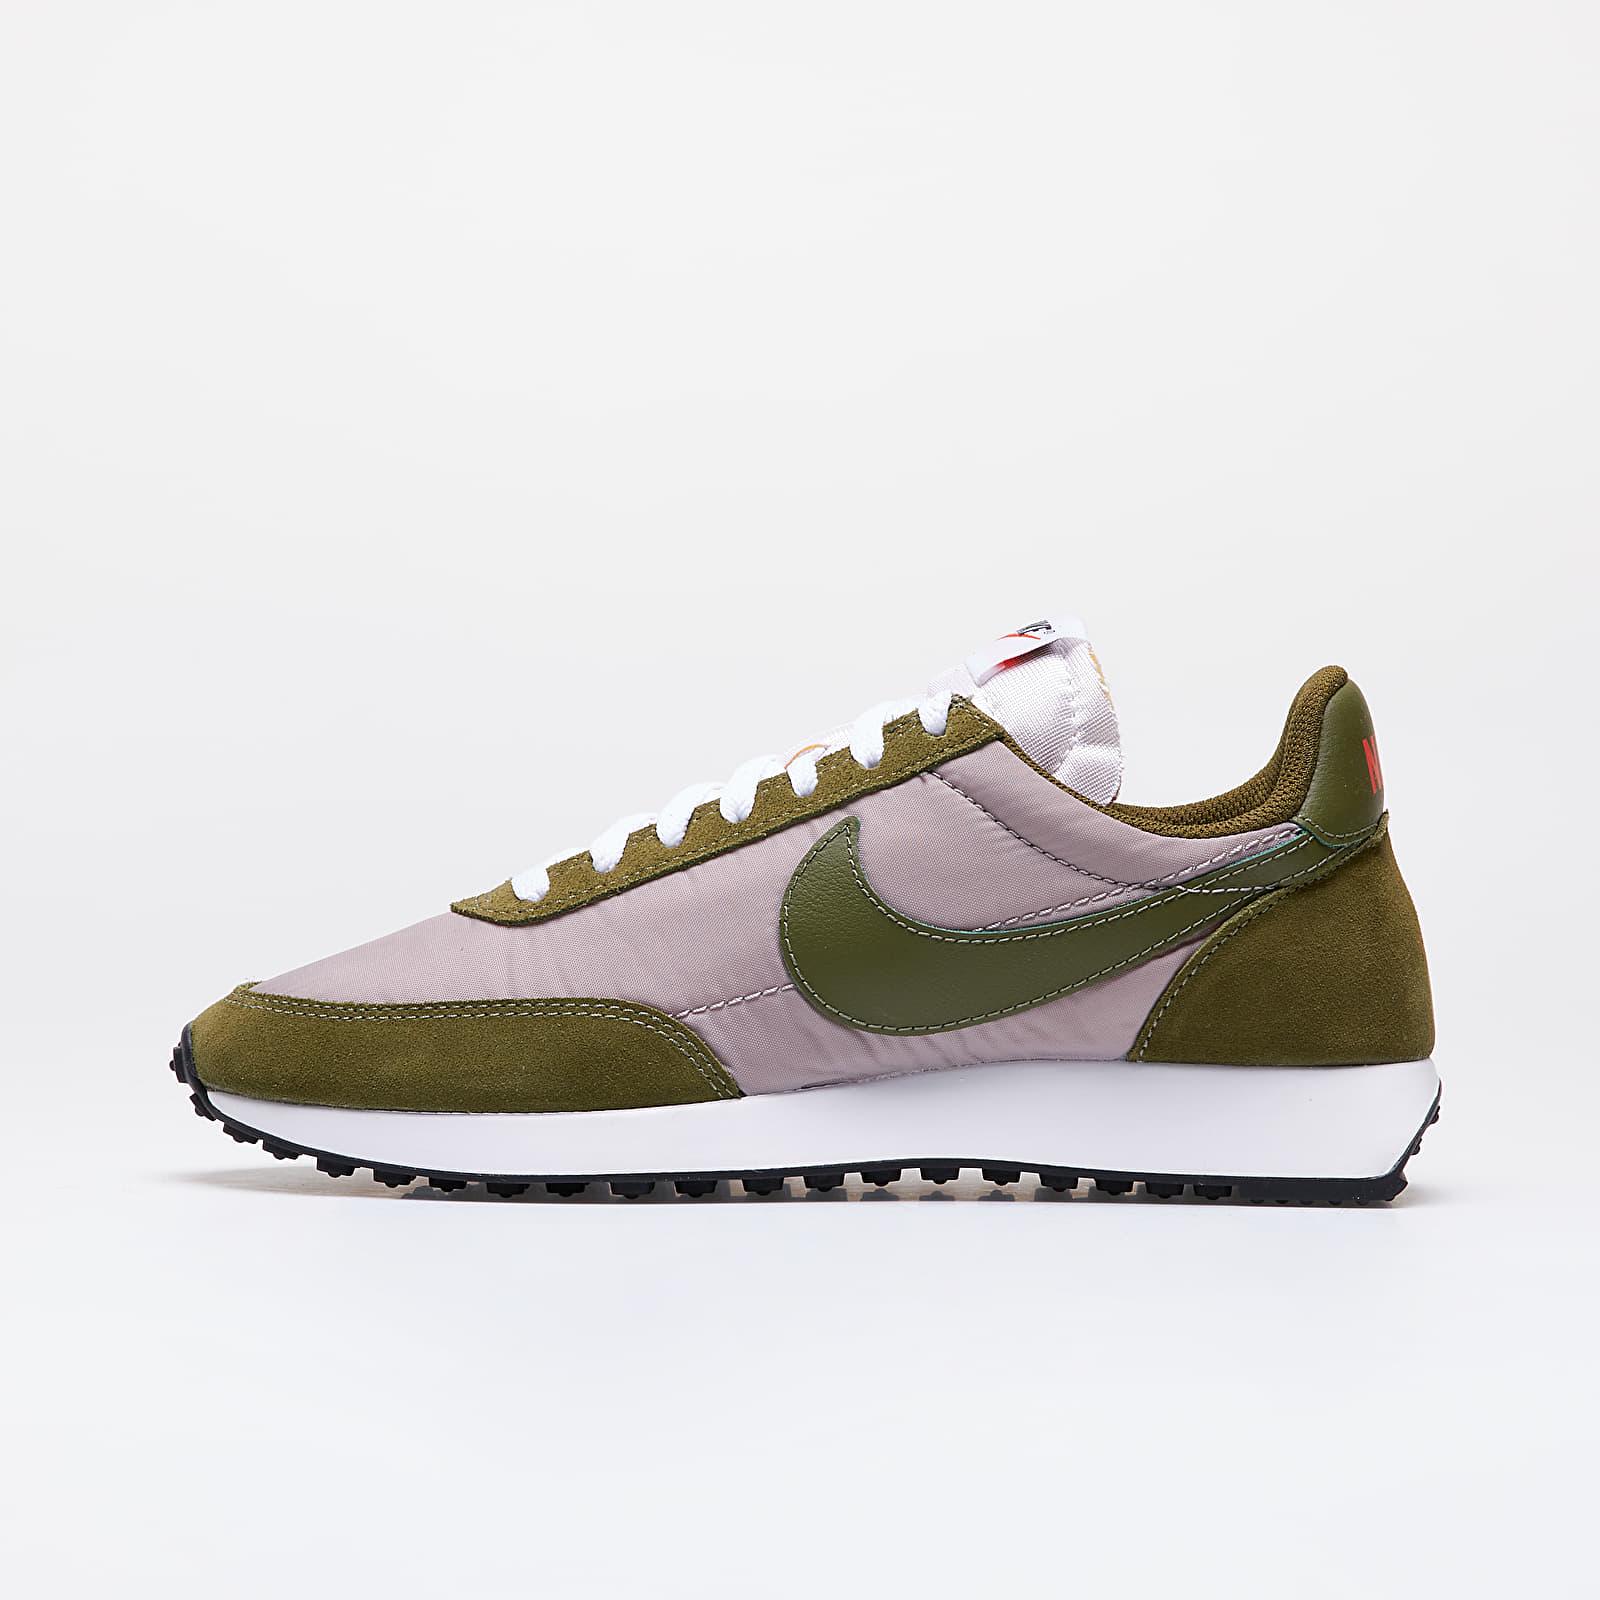 Pánské tenisky a boty Nike Air Tailwind 79 Pumice/ Legion Green-White-Black